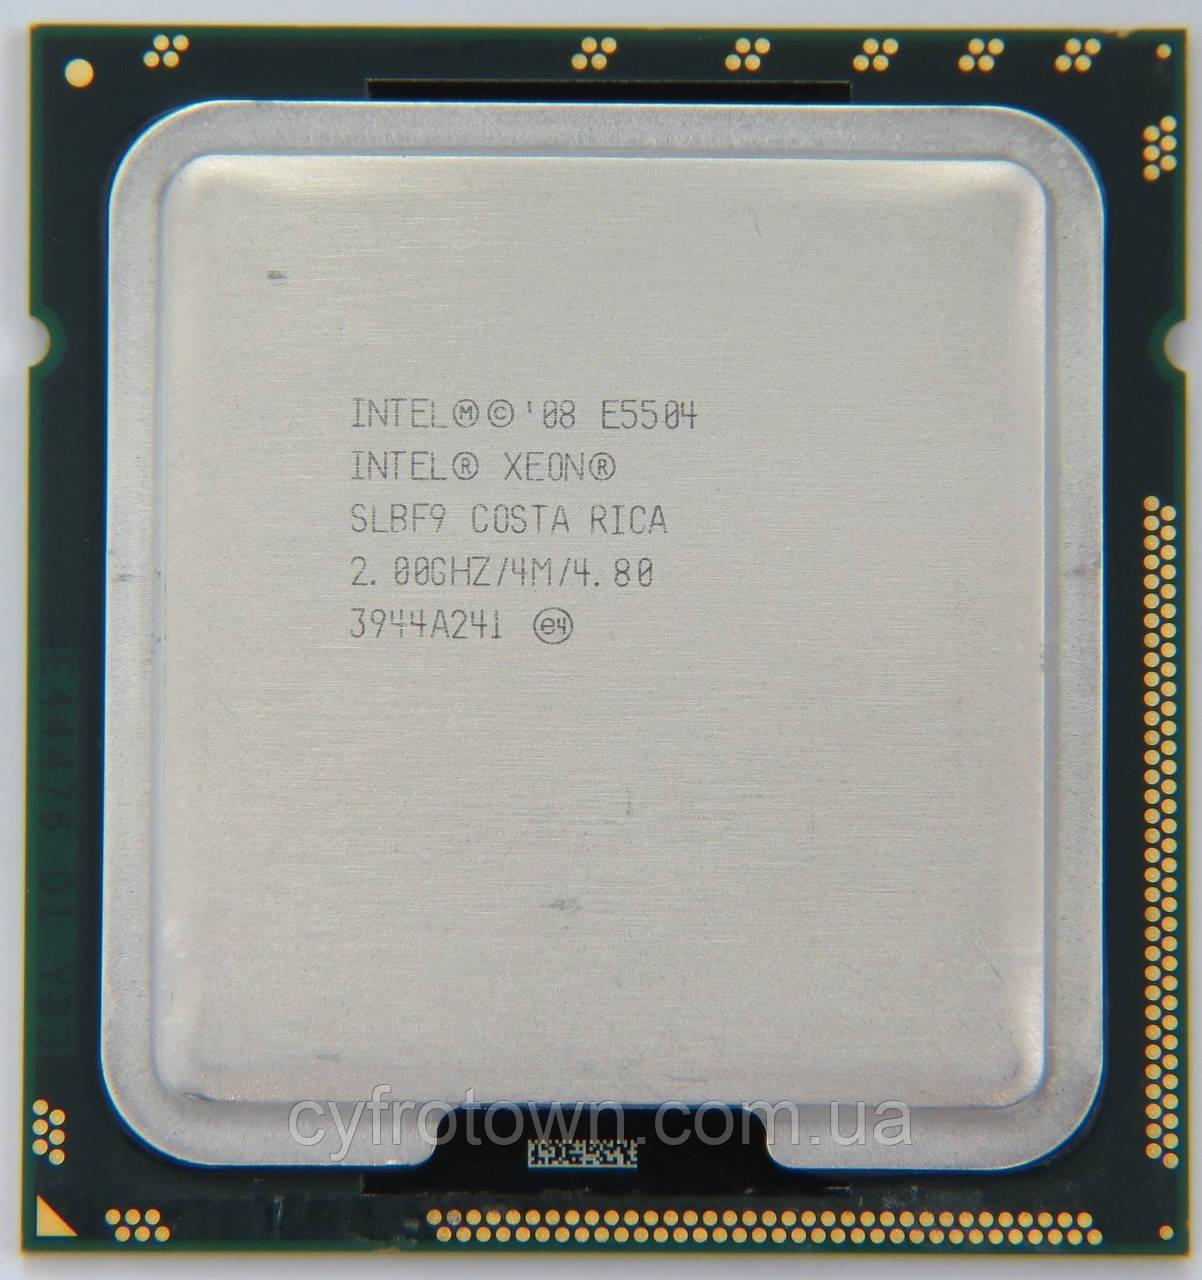 Процесор Intel XEON Quad Core E5504 4х2.00 GHz/4M s1366 4ядра 4 потоку